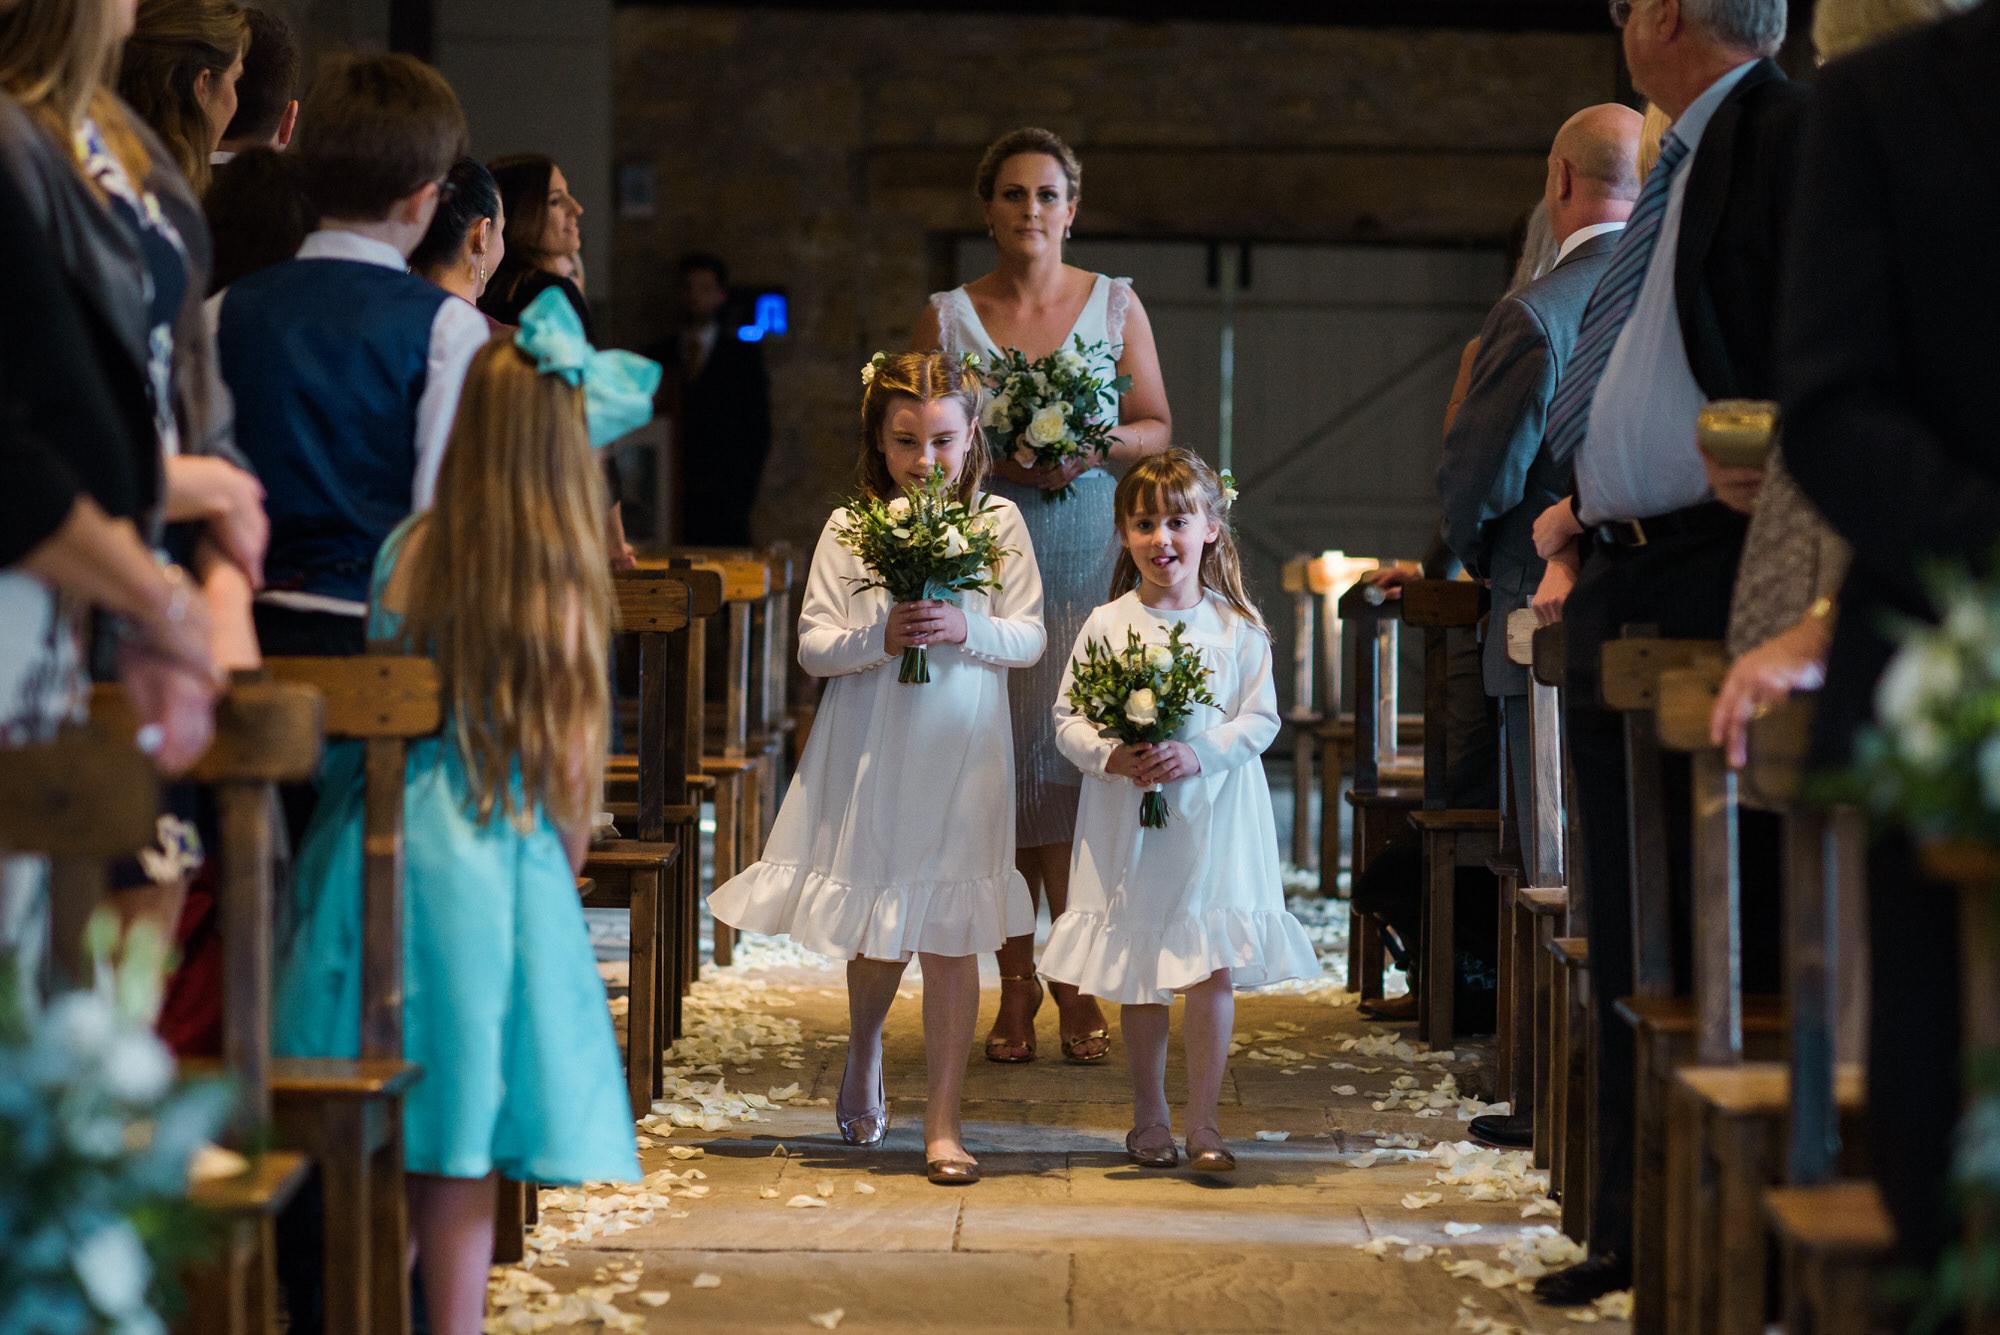 Brympton House wedding ceremony  by simon biffen photography 18